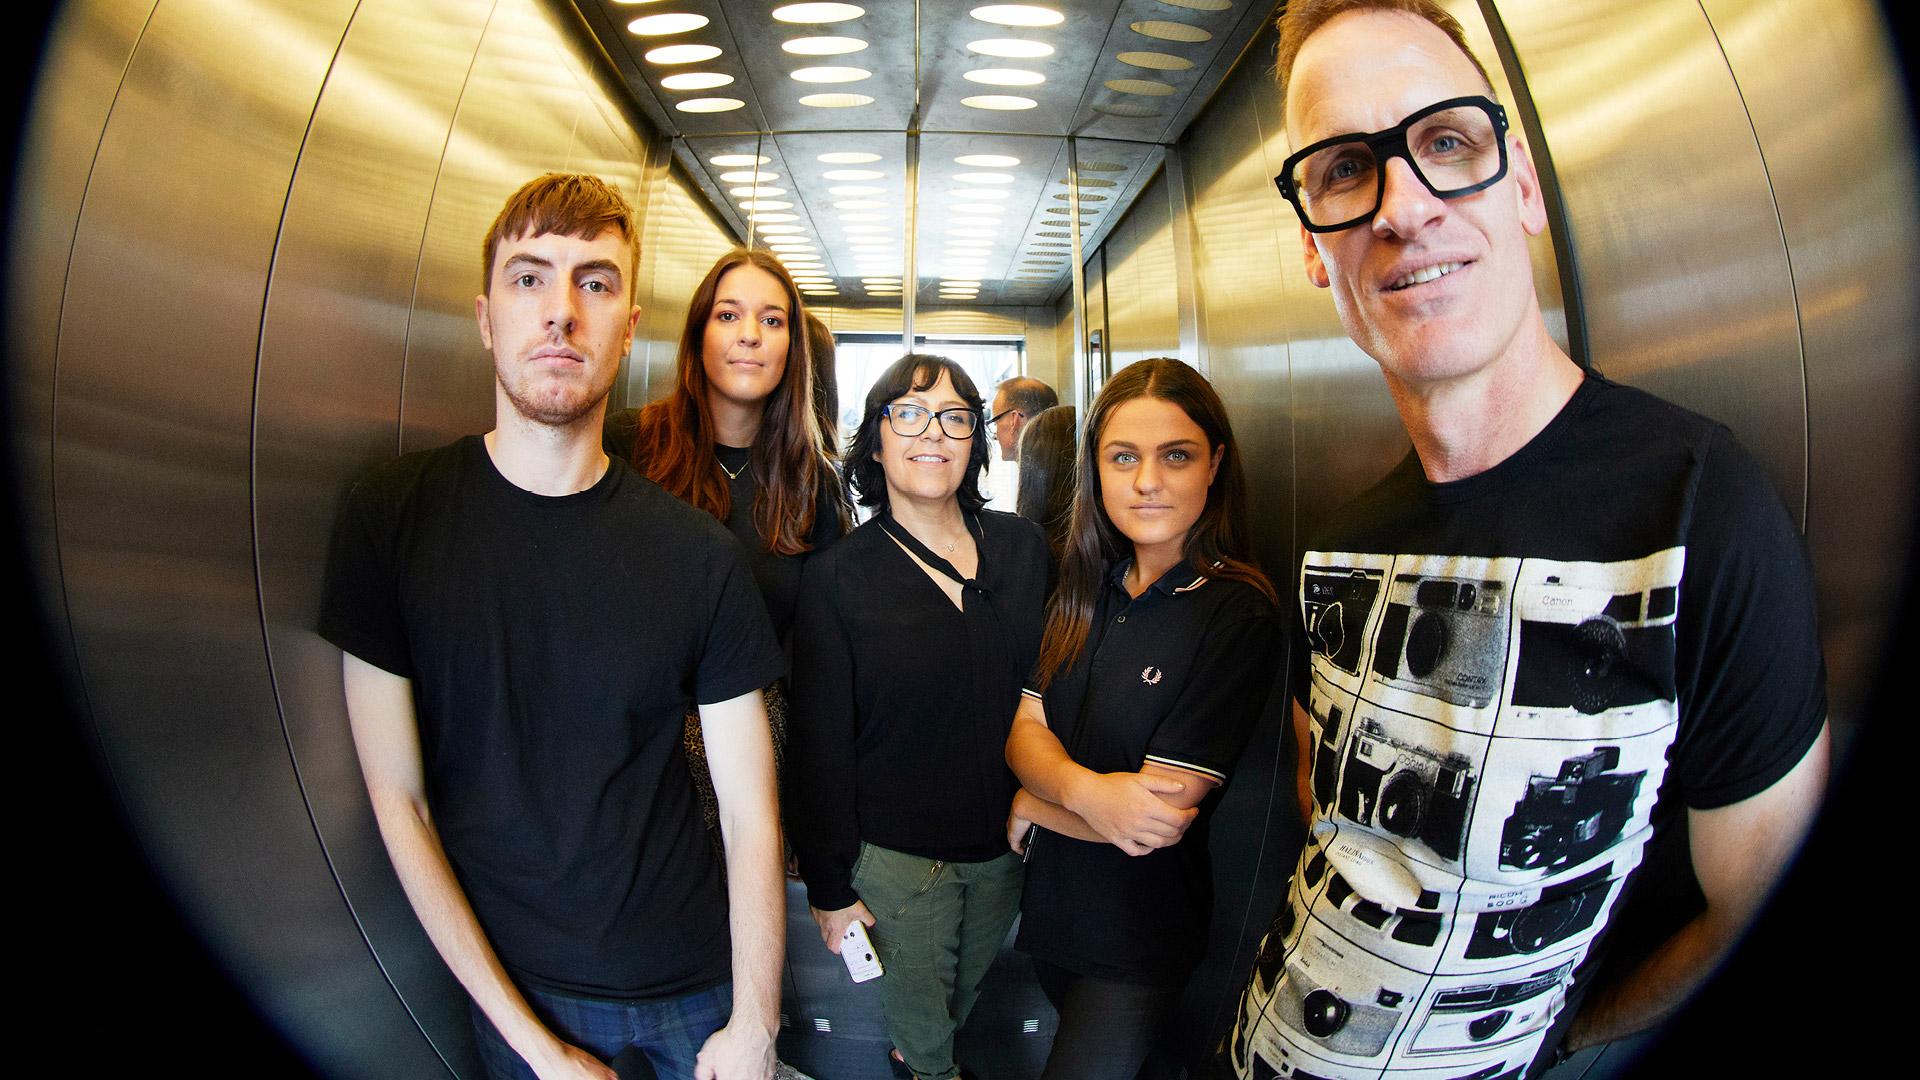 The Unknown Creative team